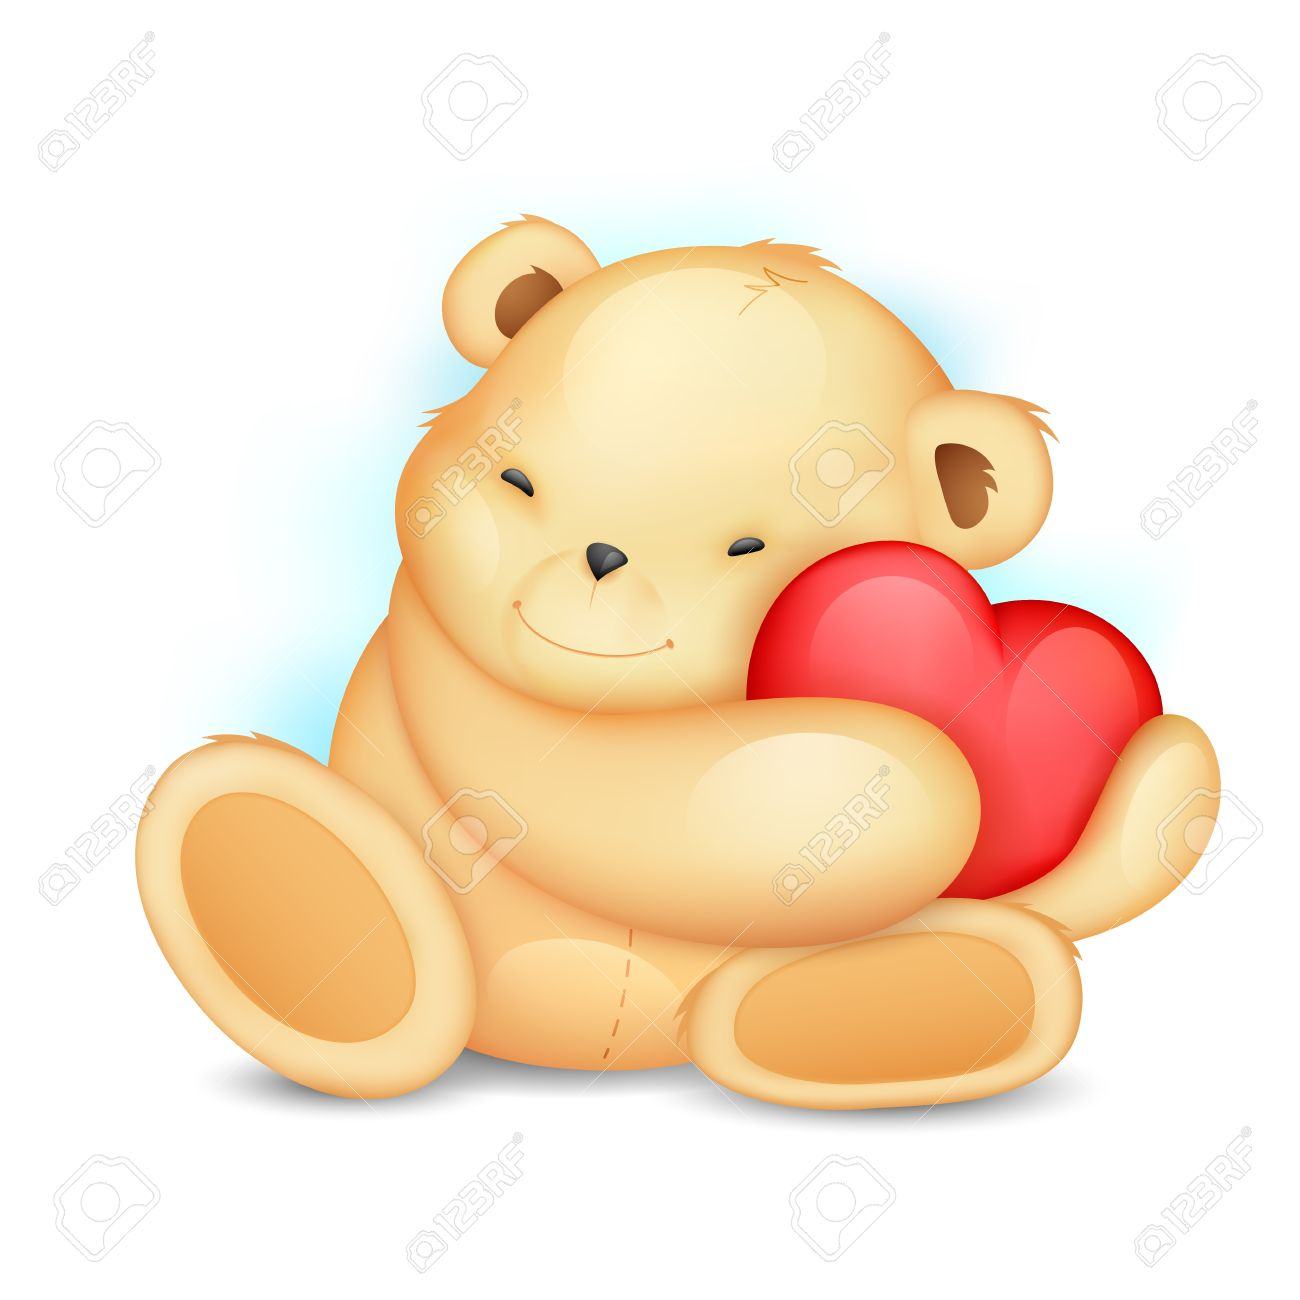 Illustration Of Cute Teddy Bear Holding Heart Royalty Free ...